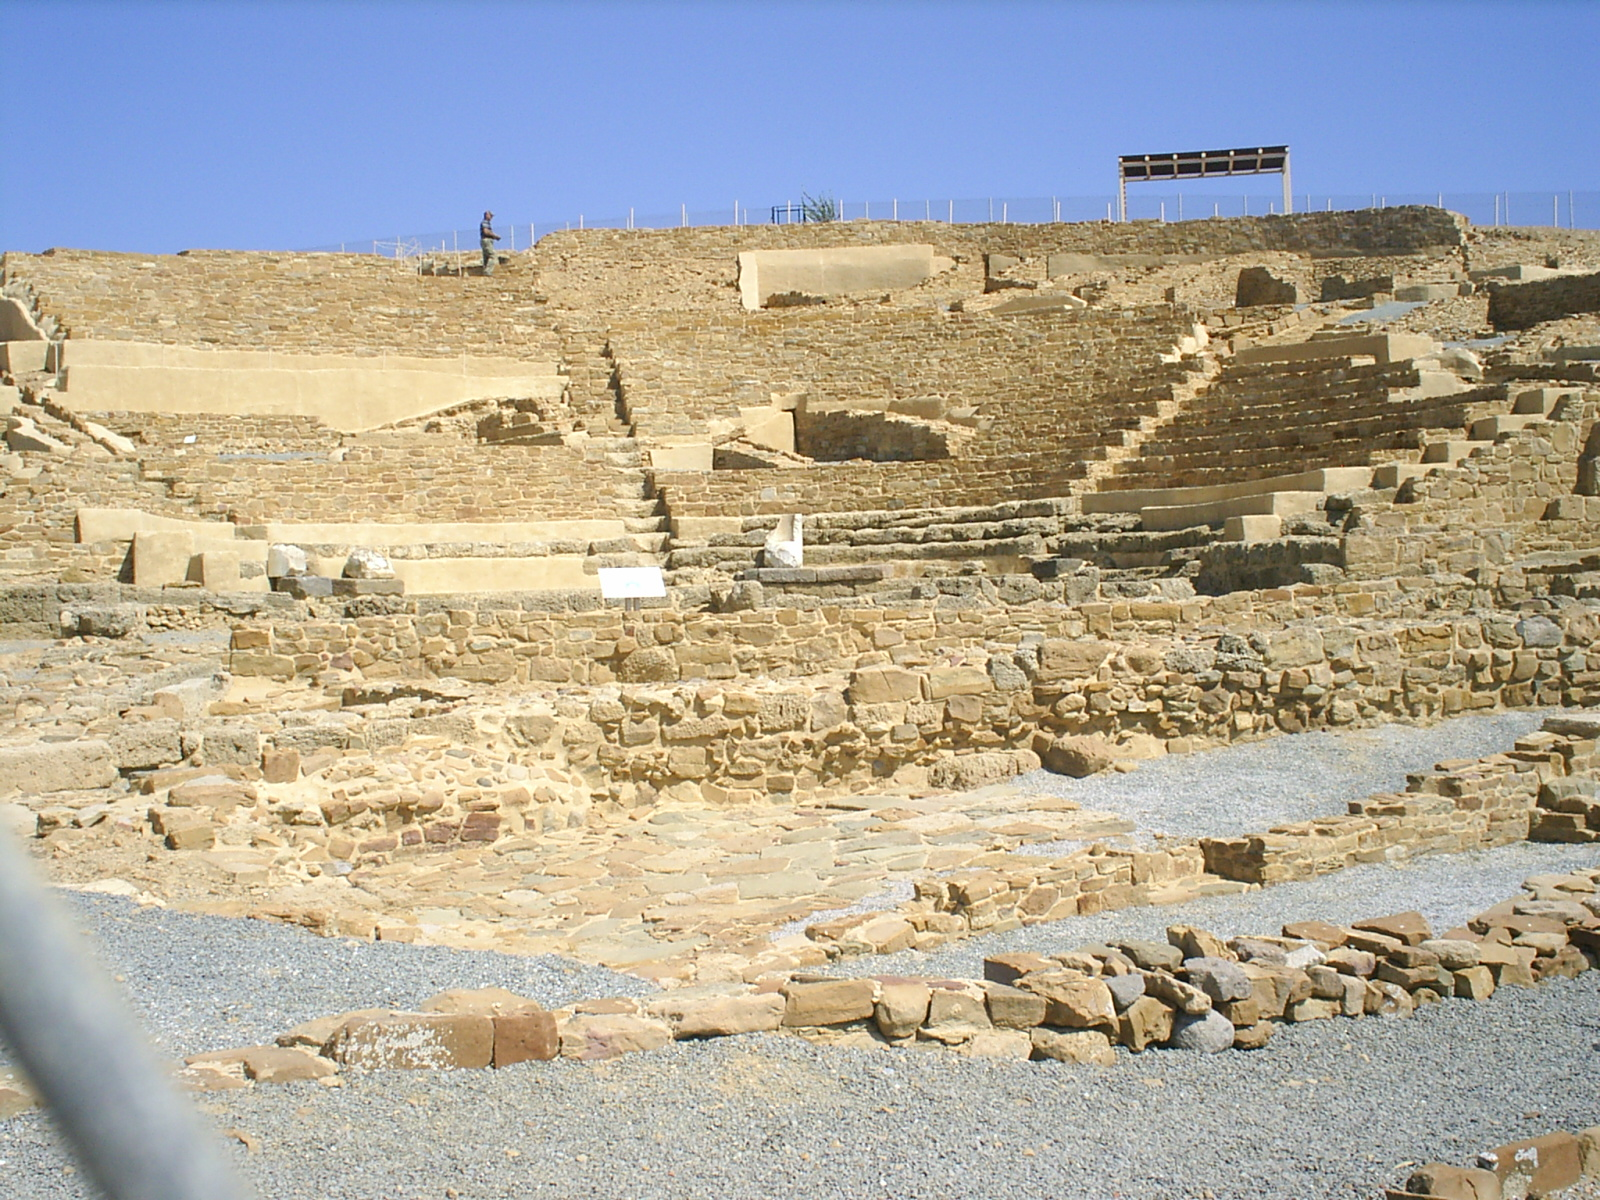 Ancient theatre in Hephaistia (Ἡφαιστία). Photo taken on June 11, 2007.